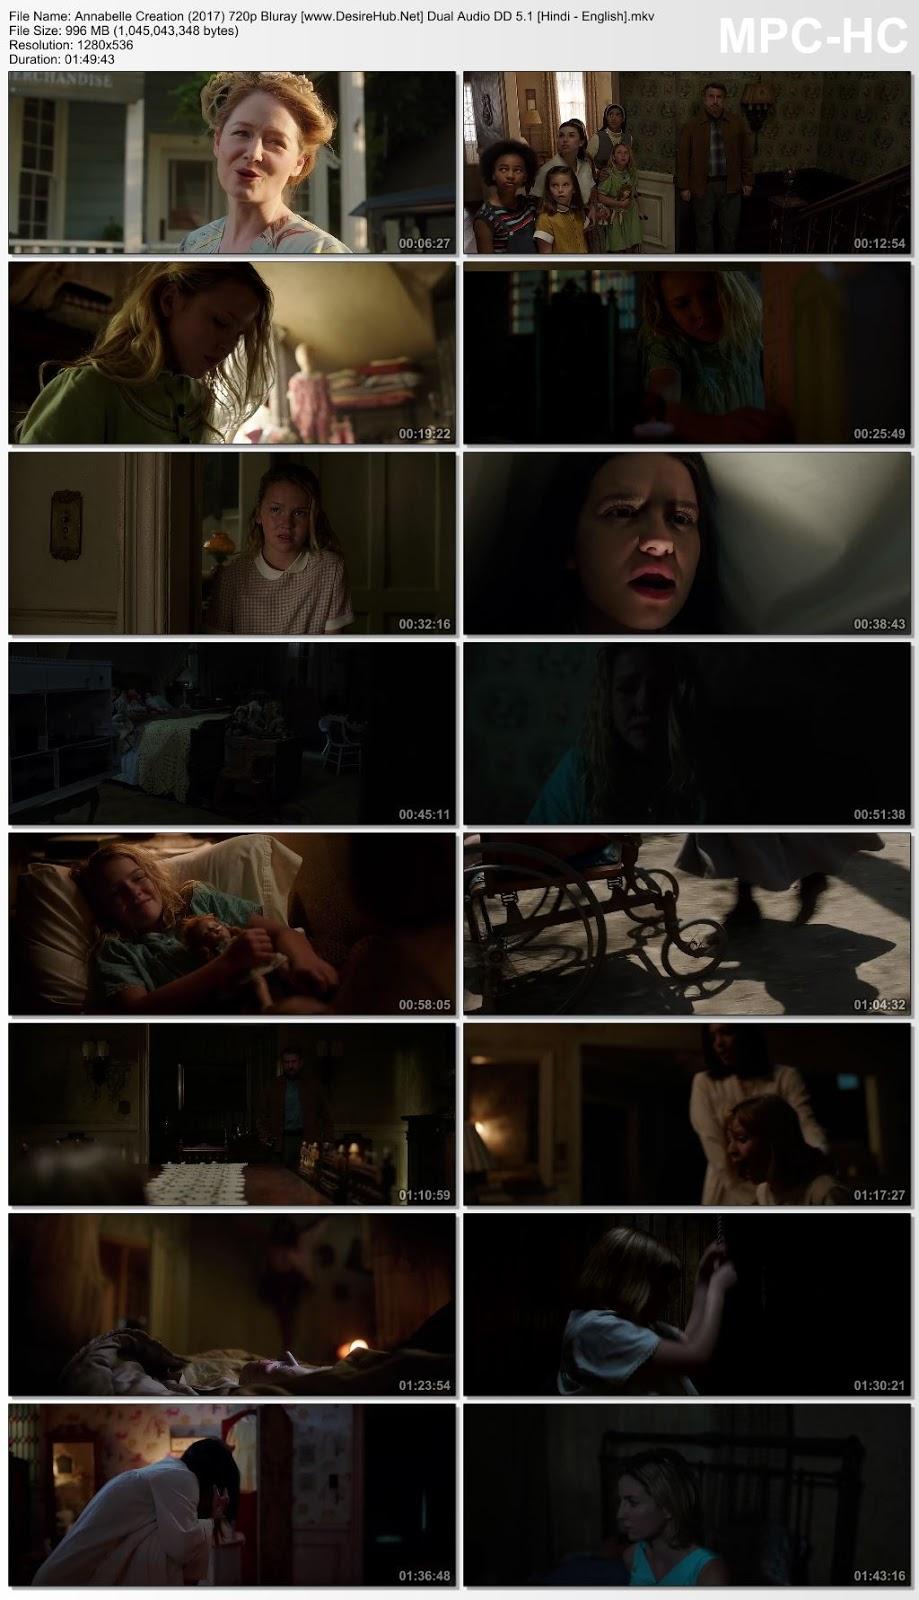 Annabelle Creation (2017) 720p Bluray Dual Audio DD 5.1 [Hindi – English] Desirehub